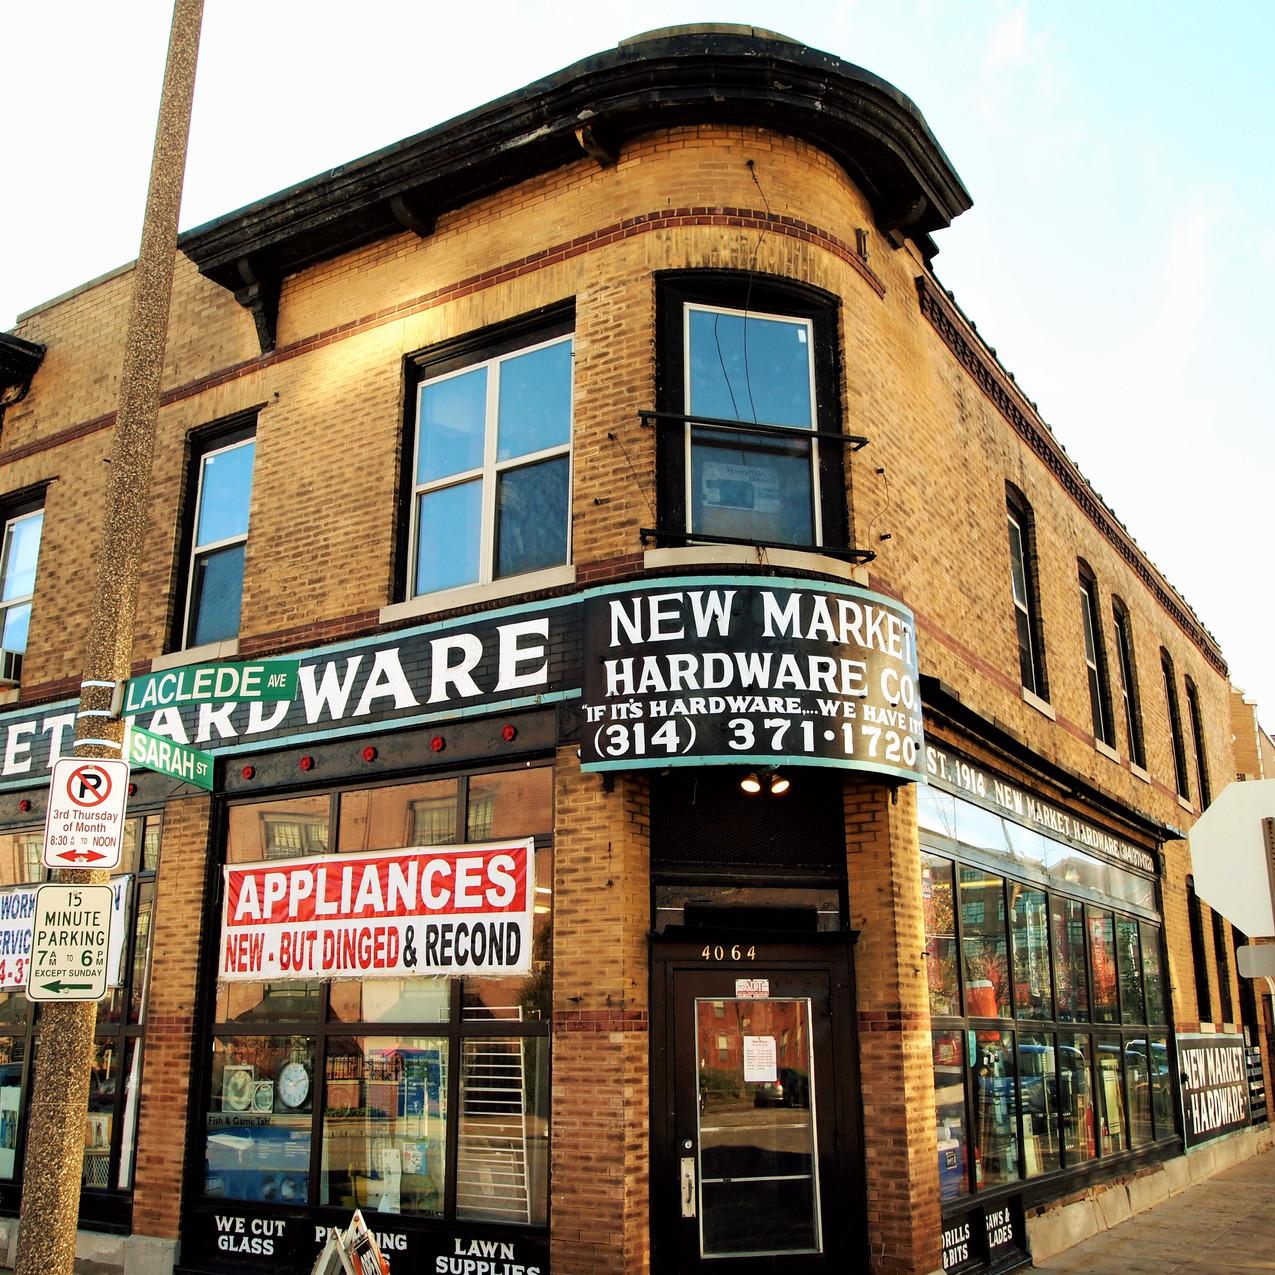 New Market Hardware -Sarah & Laclede 63108